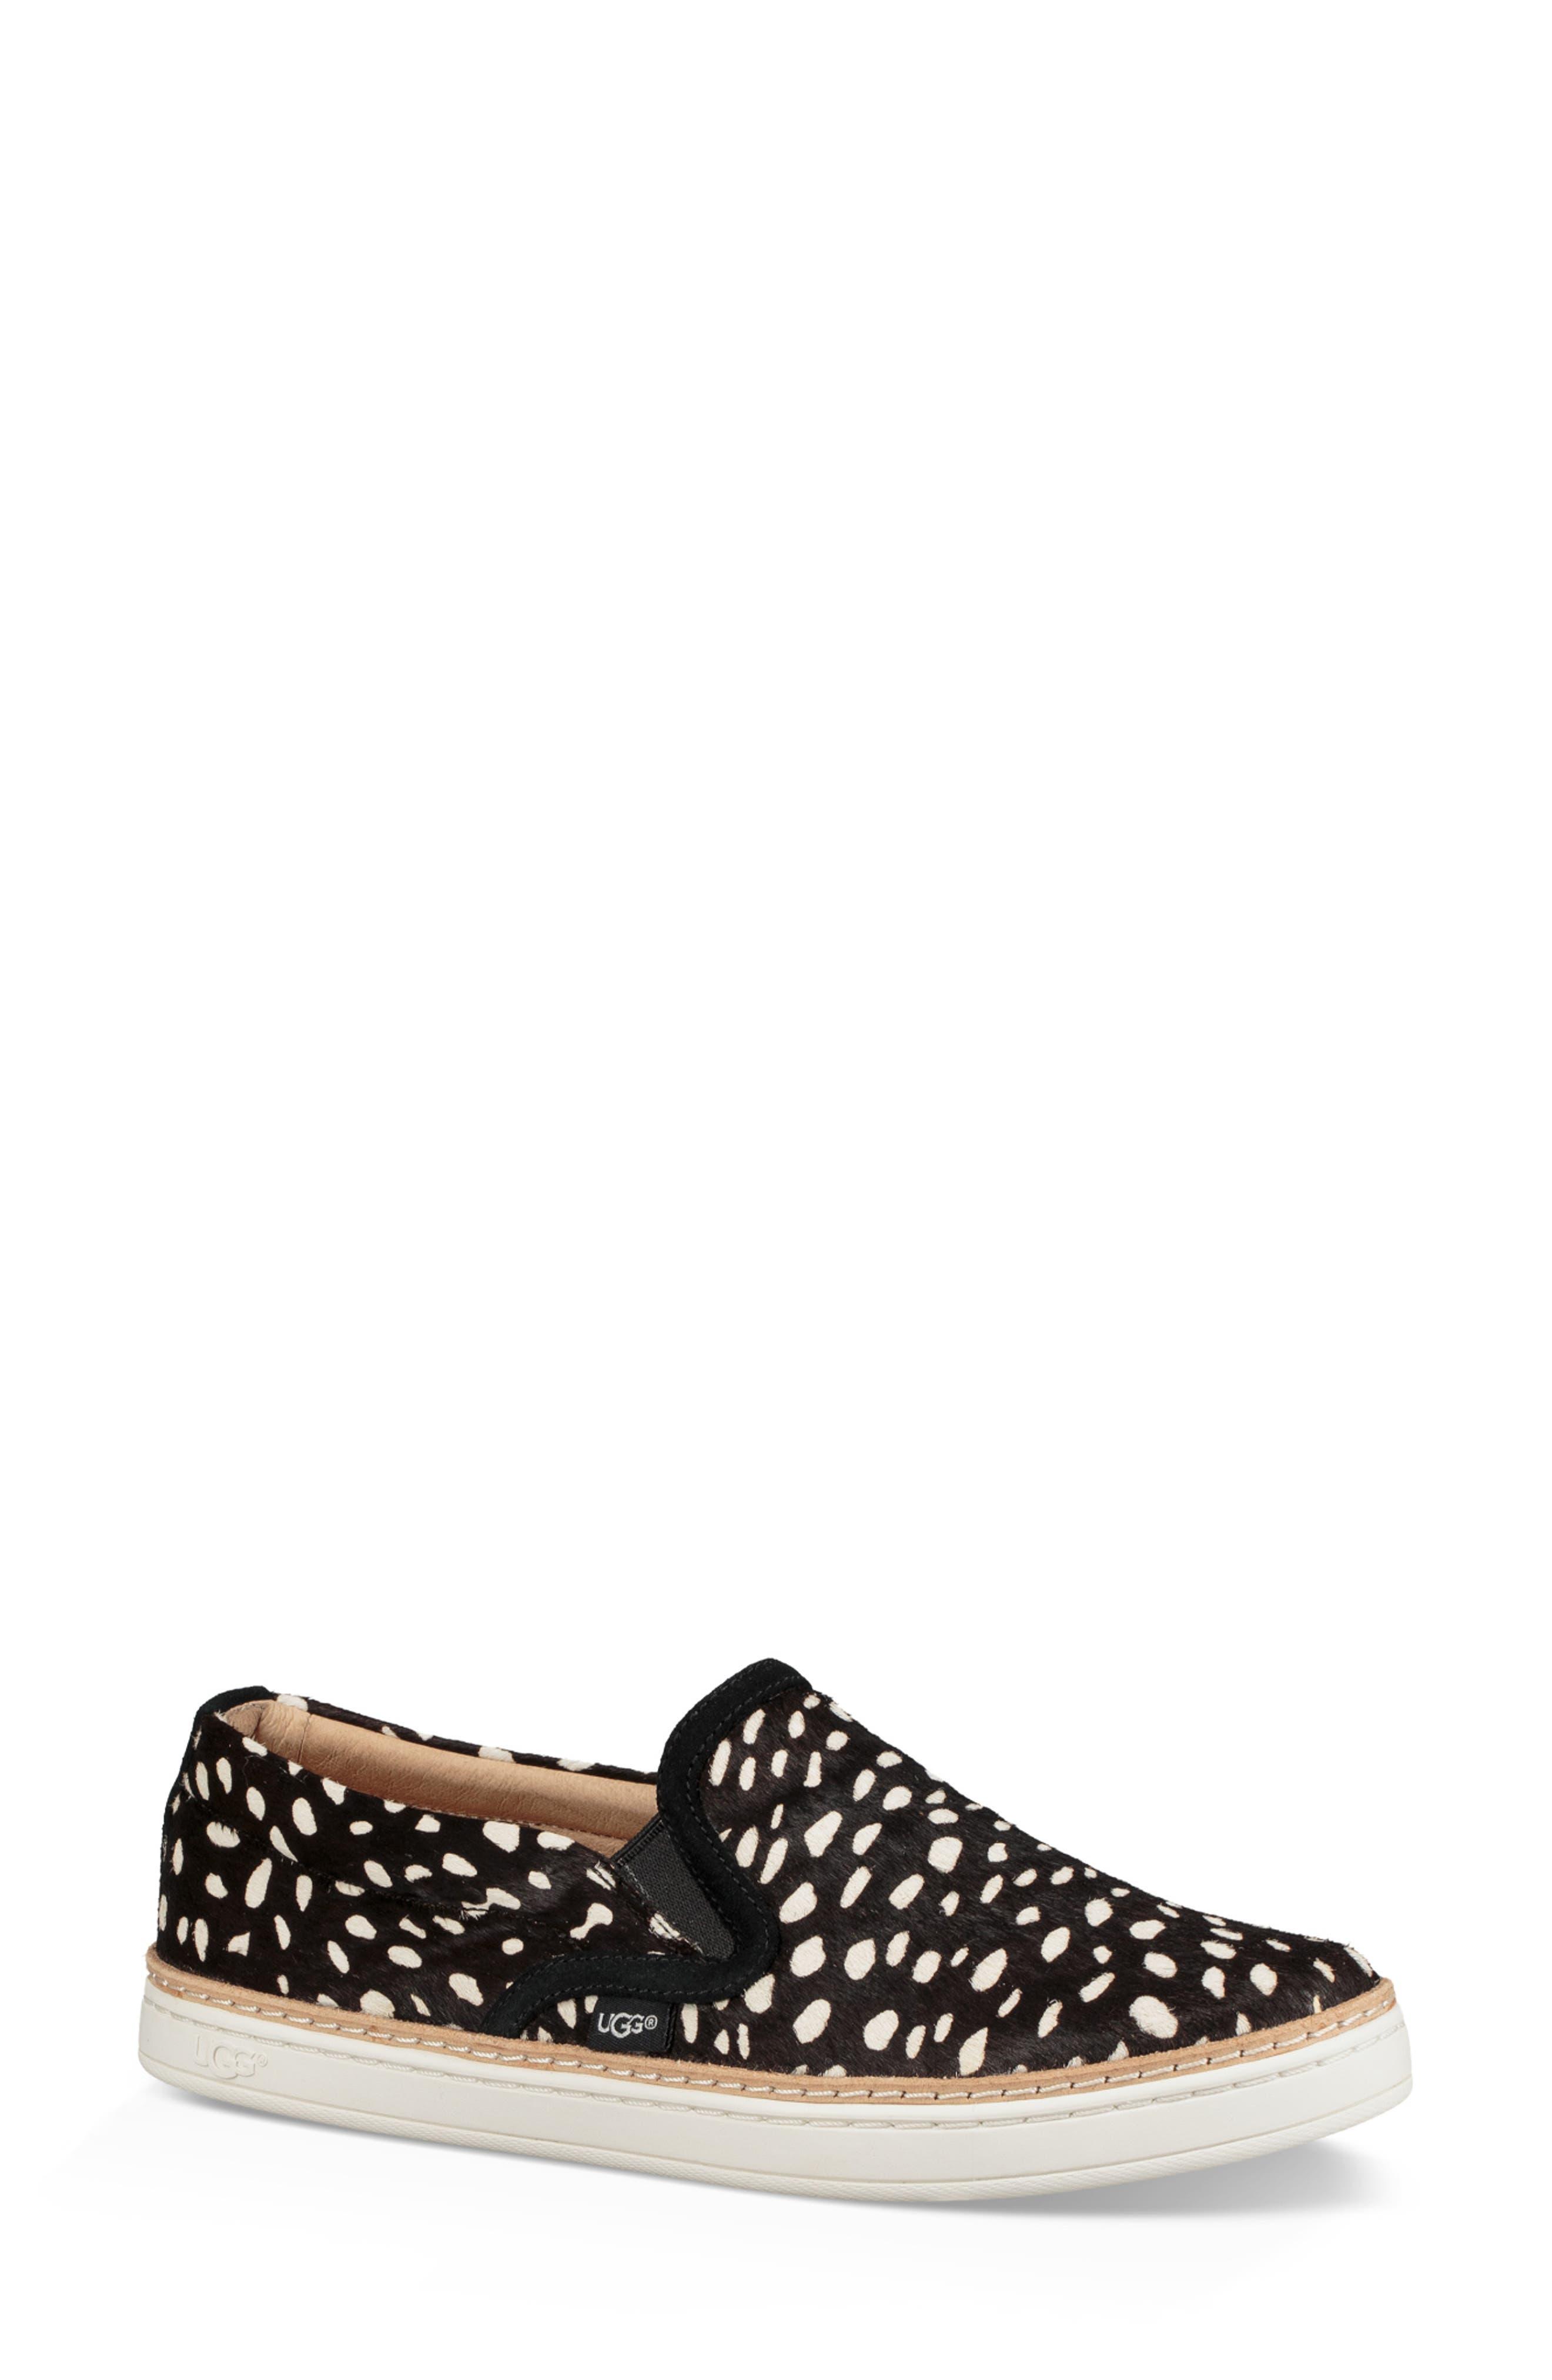 Soleda Genuine Calf Hair Slip-On Sneaker,                             Main thumbnail 1, color,                             BLACK